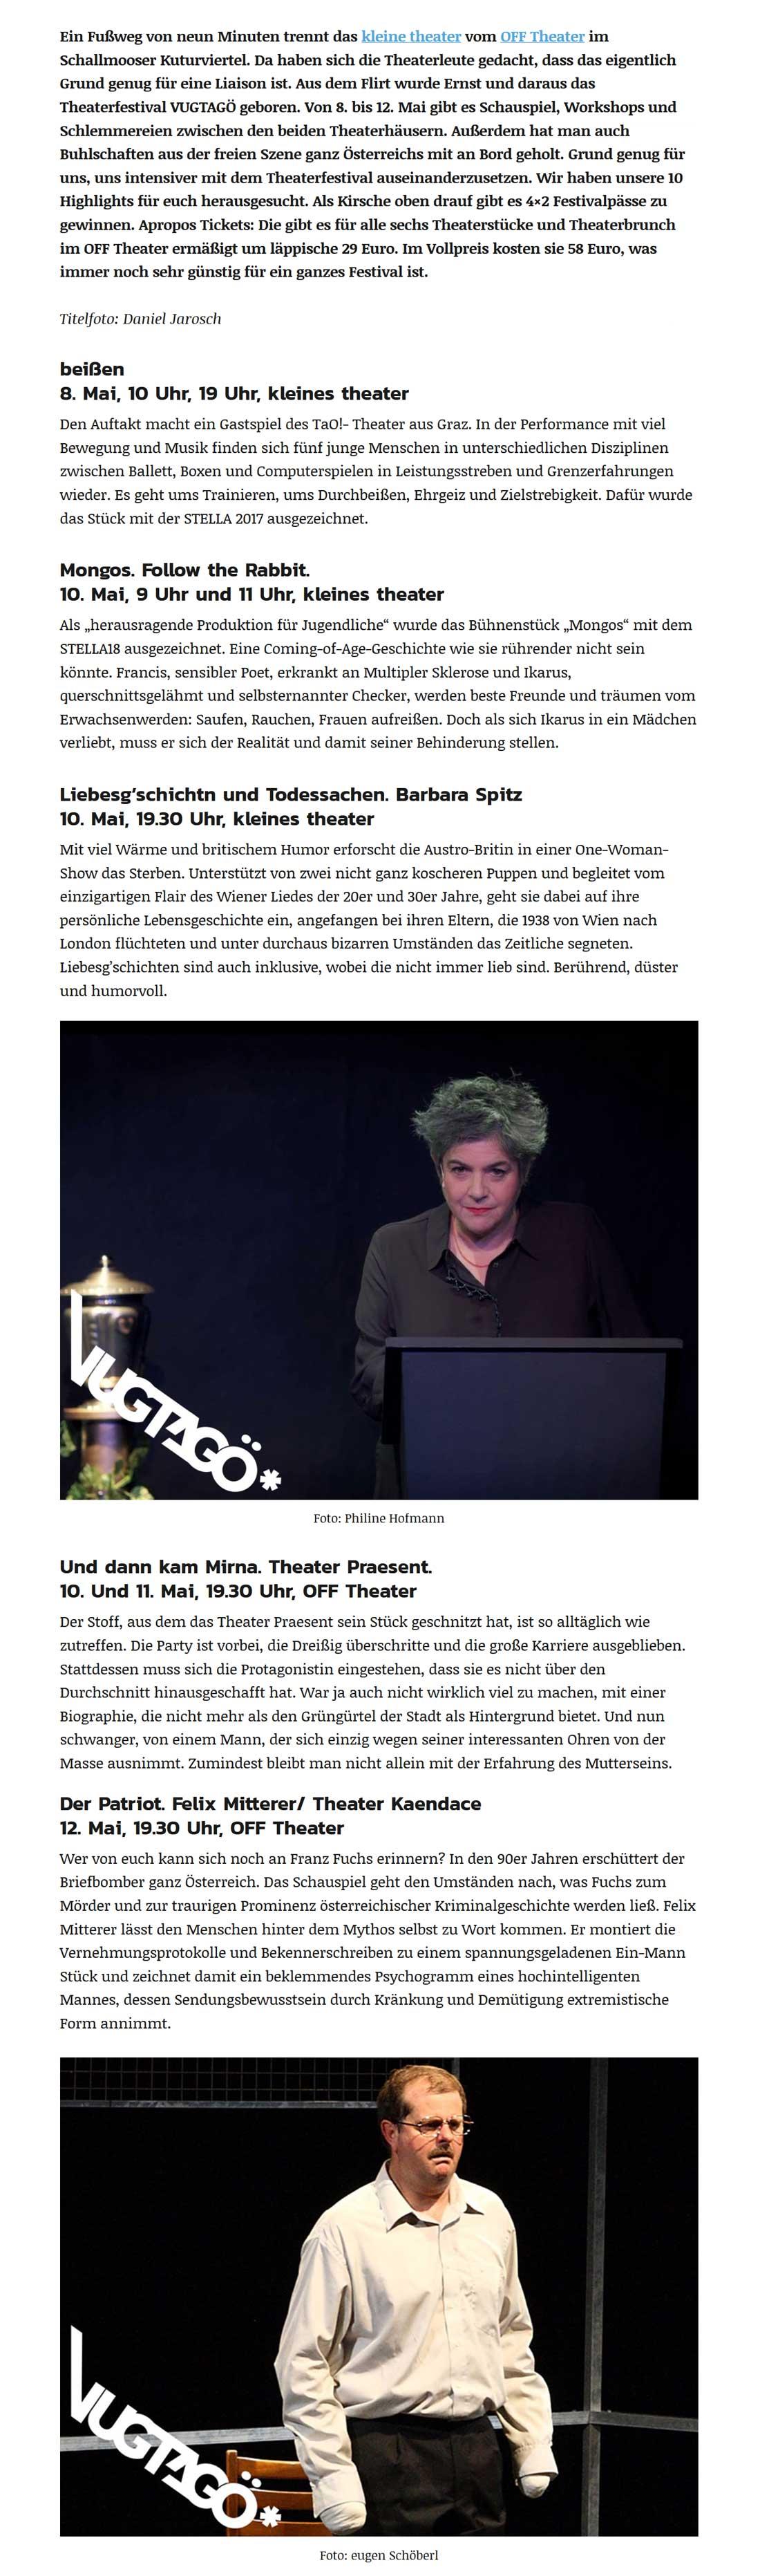 2019 04 24 vugtagoe FF 02 - Unsere 10 Highlights am VUGTAGÖ* Theaterfestival - Fräulein Flora vom 24.04.2019